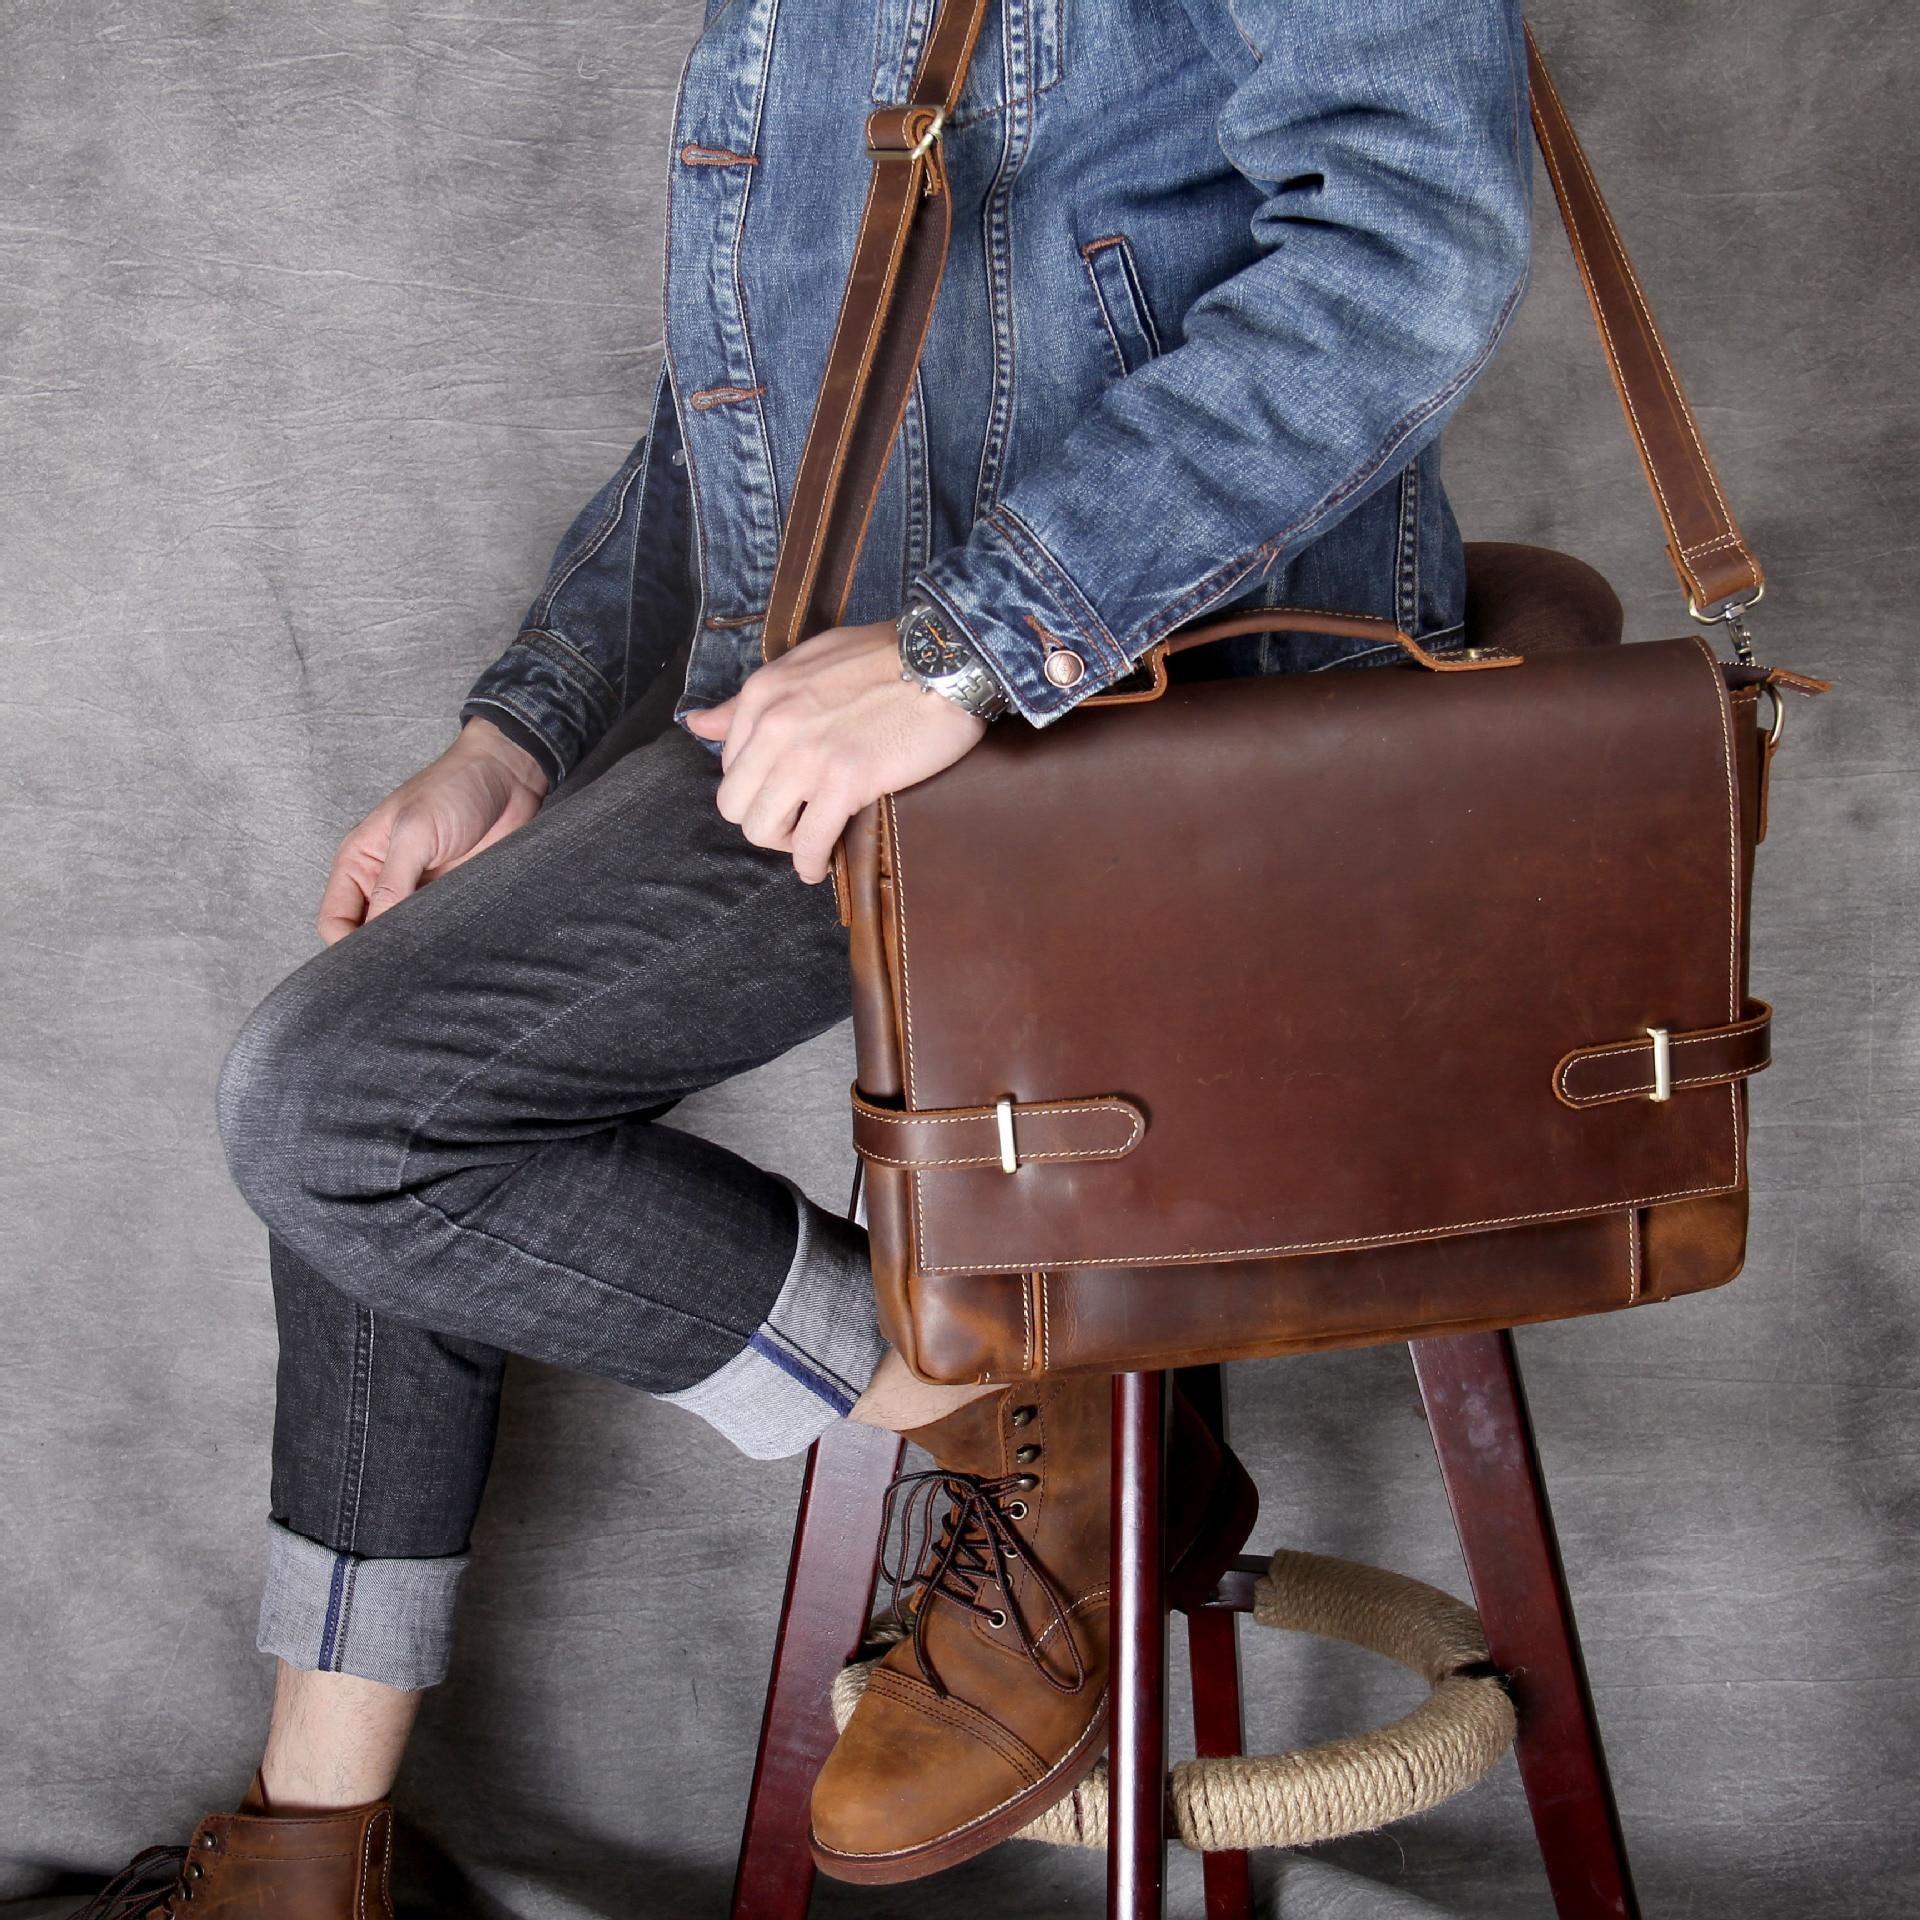 Mens Rare Crazy Horse Leather Portfolios Bags Male Large Genuine Leather Business Briefcase Laptop Handbag Messenger Bag